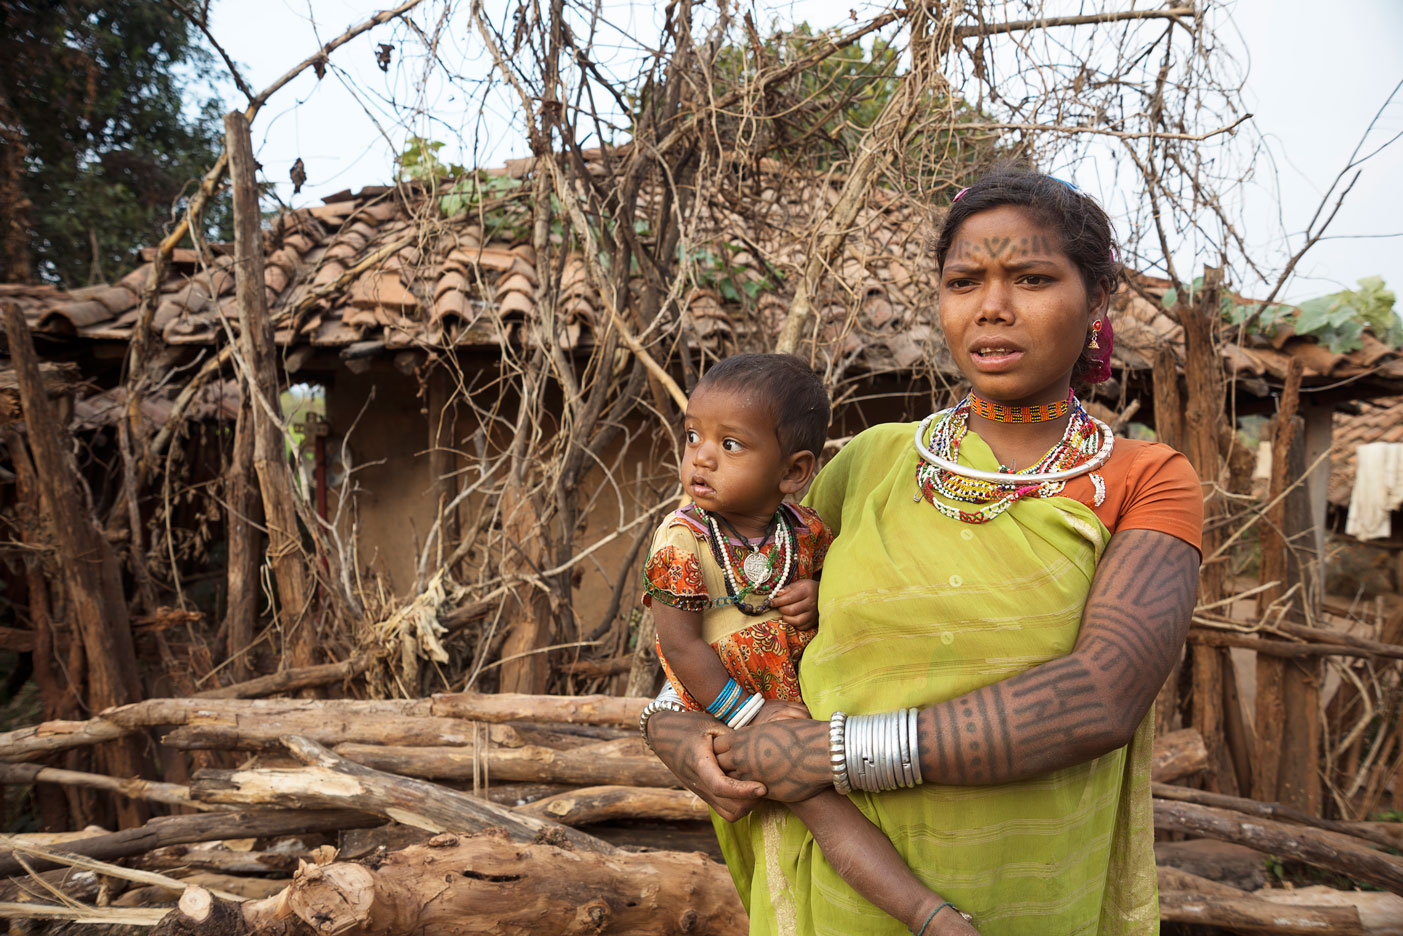 Baiga Tribe of Chhattisgarh